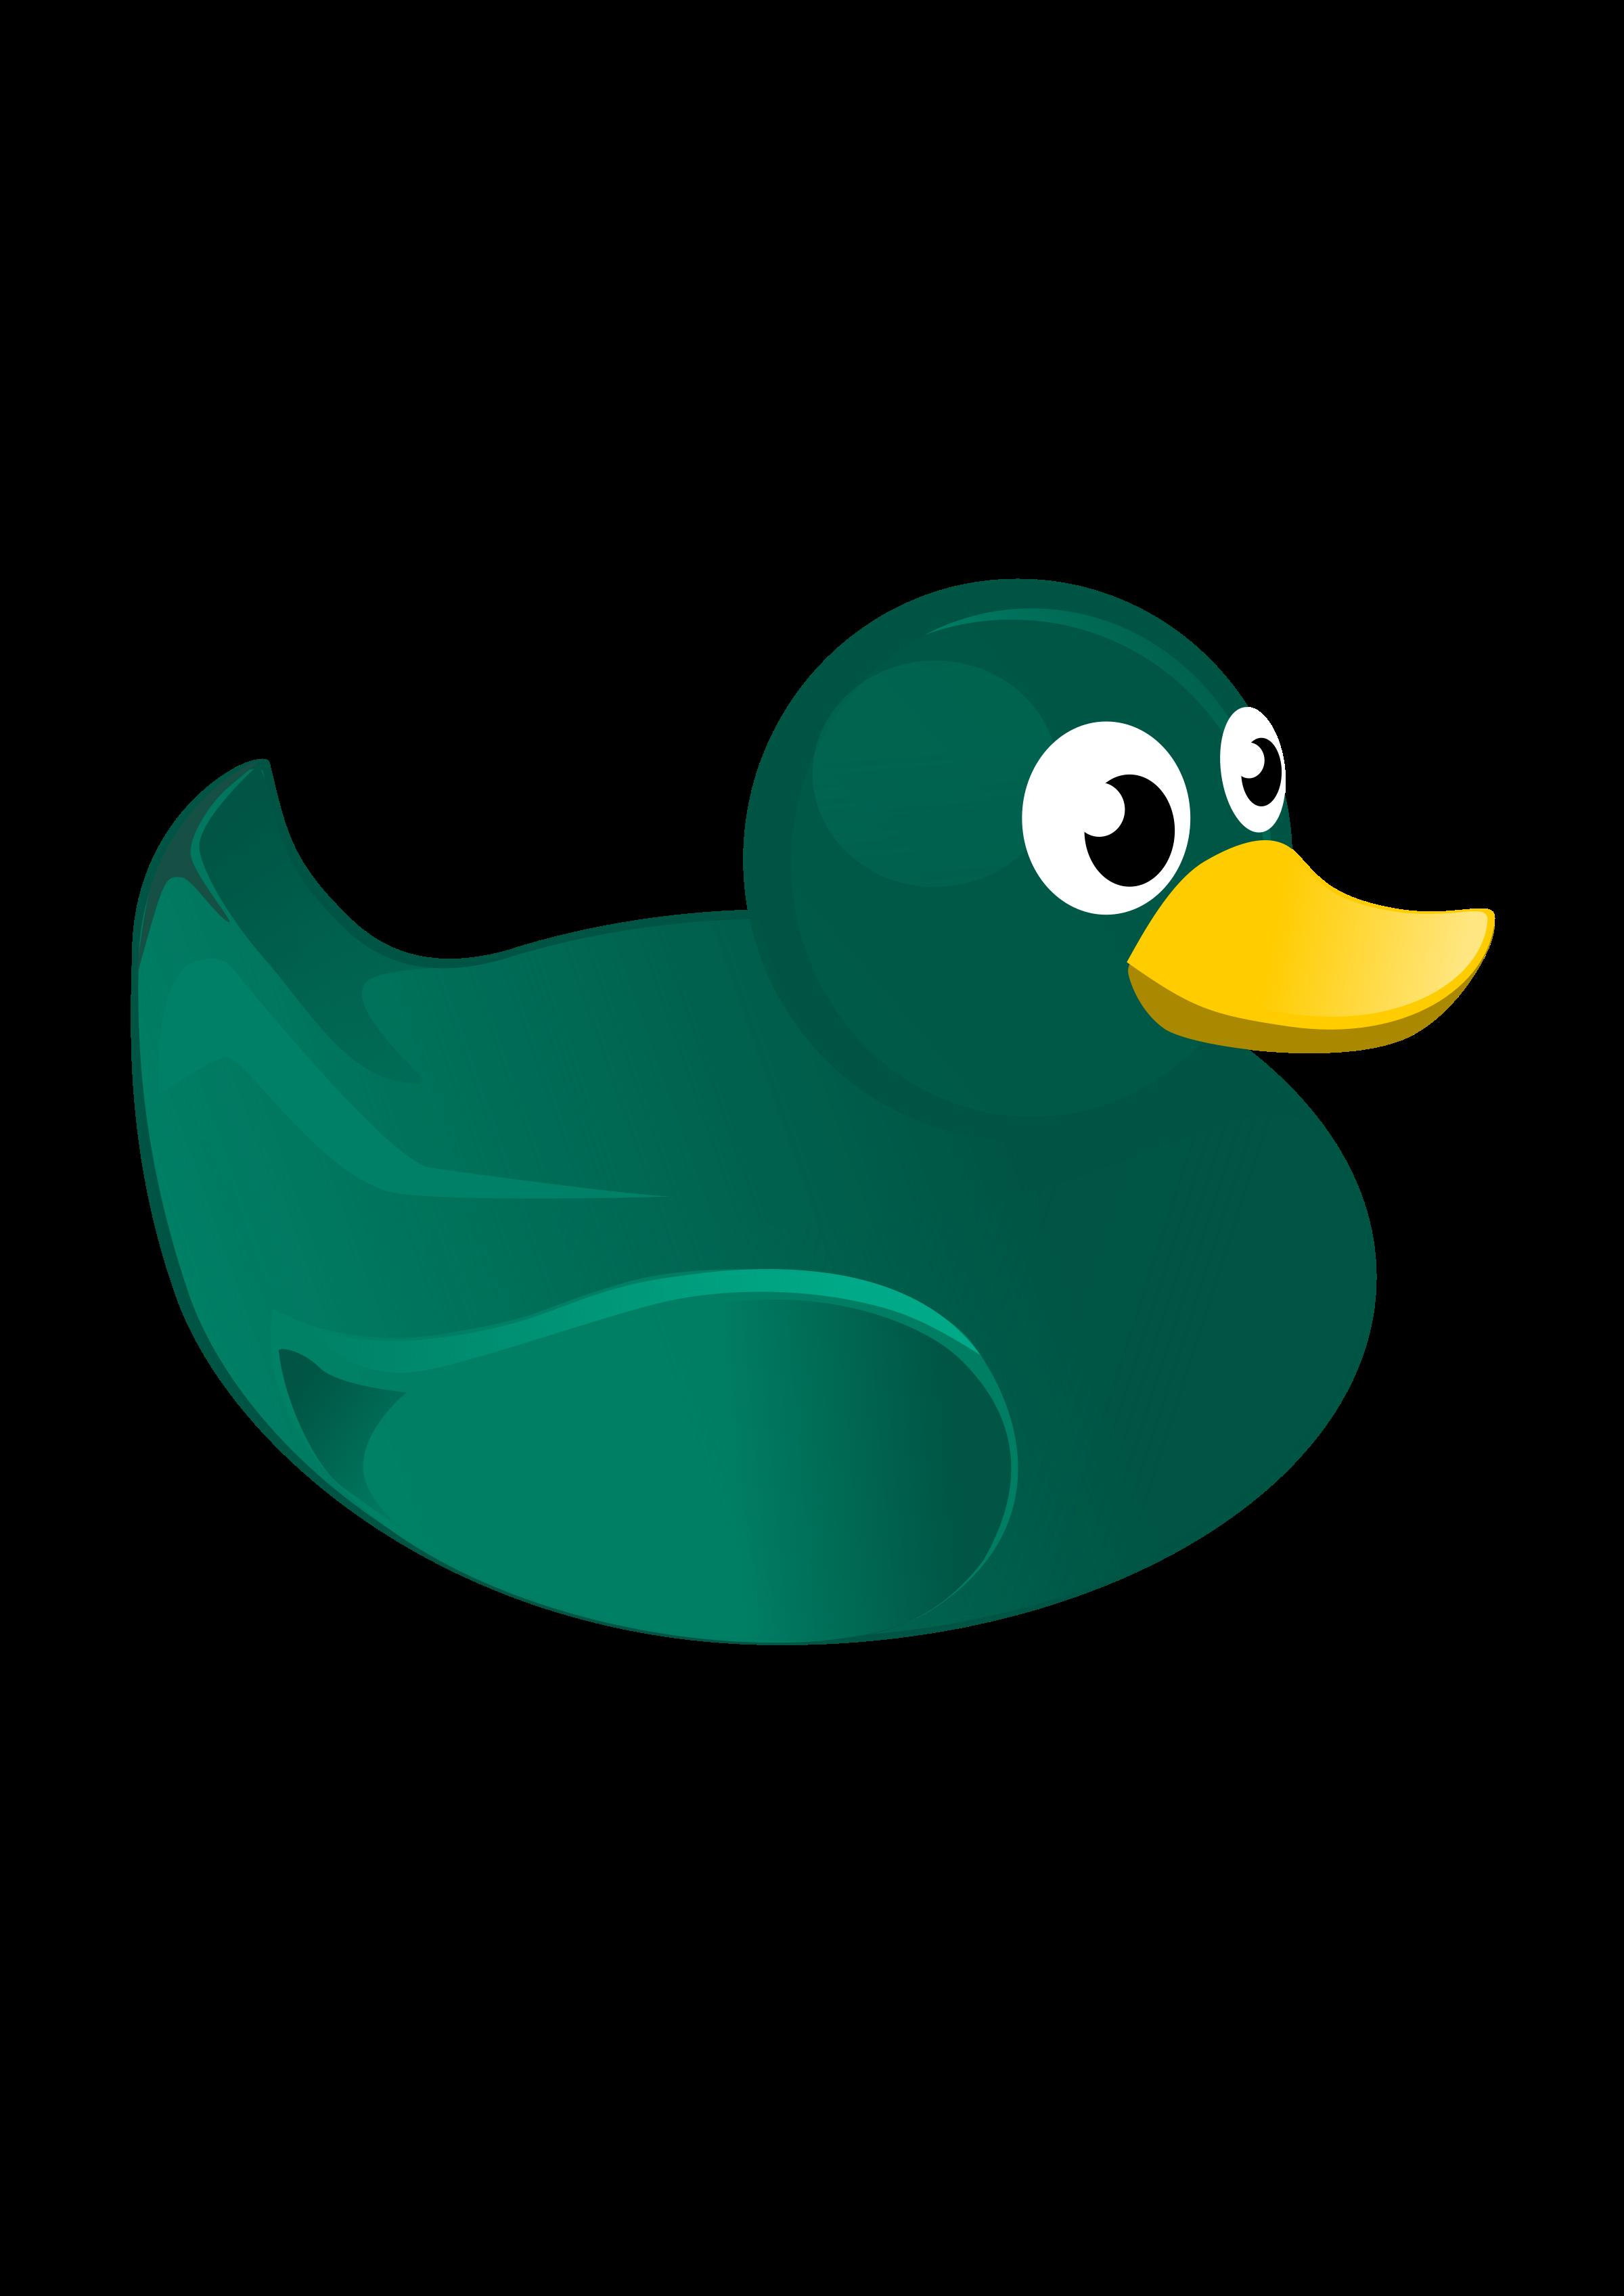 Rubber duck big image. Ducks clipart green